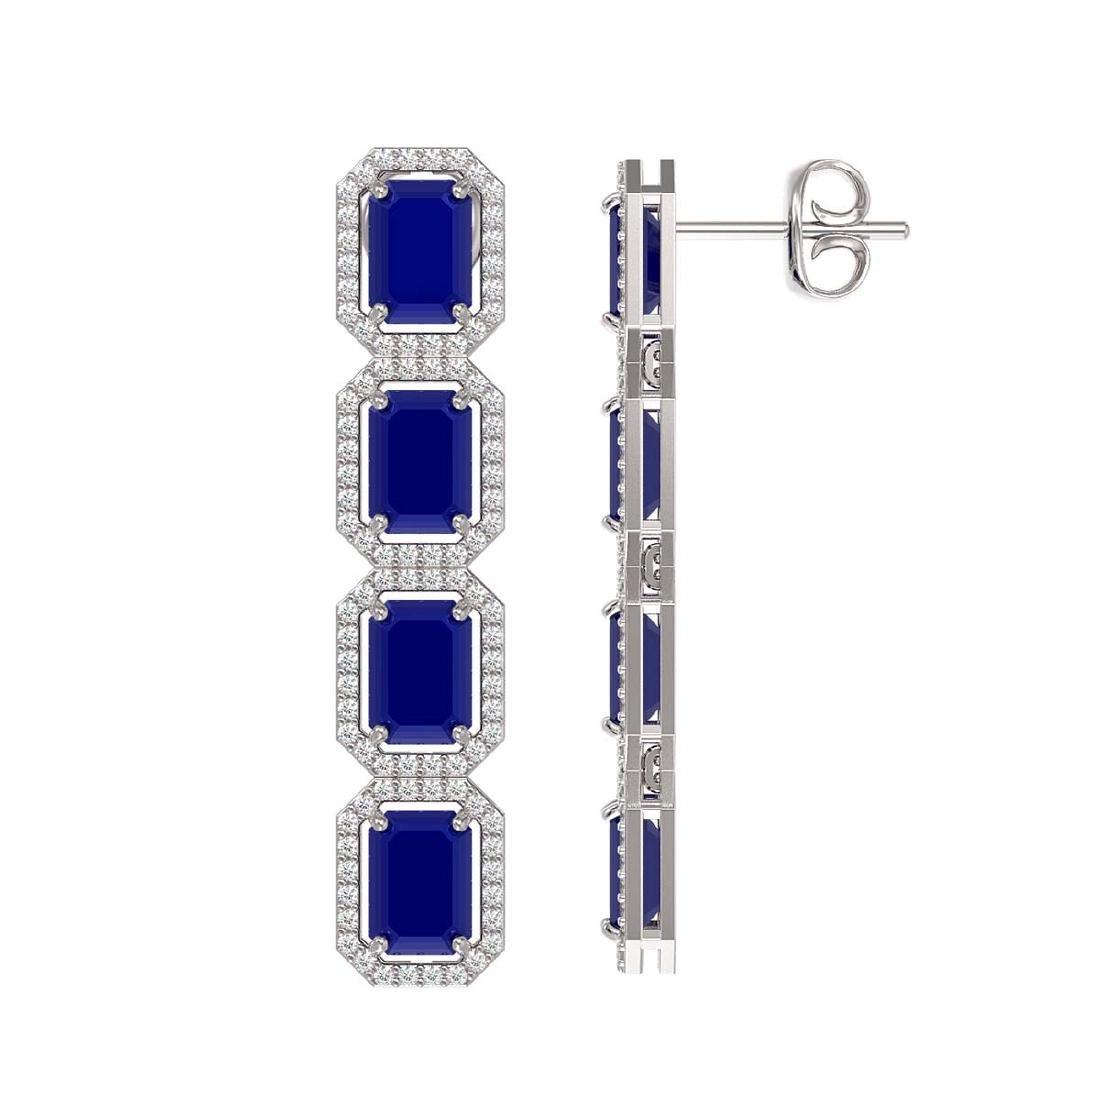 12.33 CTW Sapphire & Diamond Halo Earrings 10K White - 2